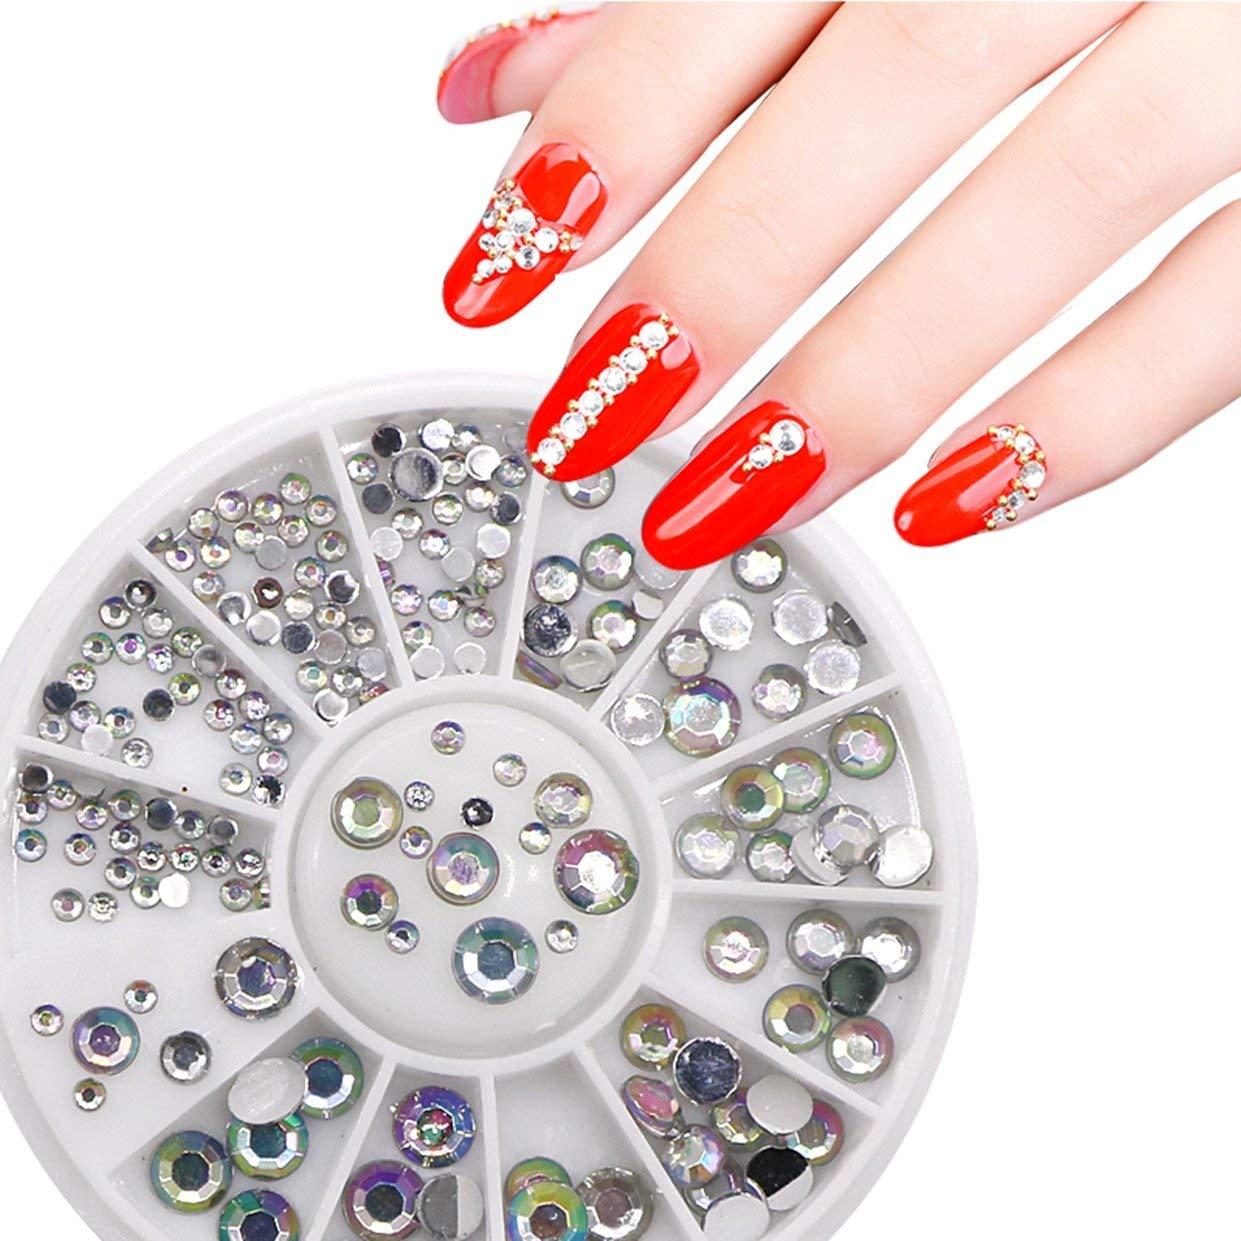 1 Pack 3D Crystal Nail Art Rhinestone Wheel Glitter Decoration DIY Manicure Nails Tool Tips Kits Pleasure Popular Xmas Christmas Winter Snow Holidays Tools Kit